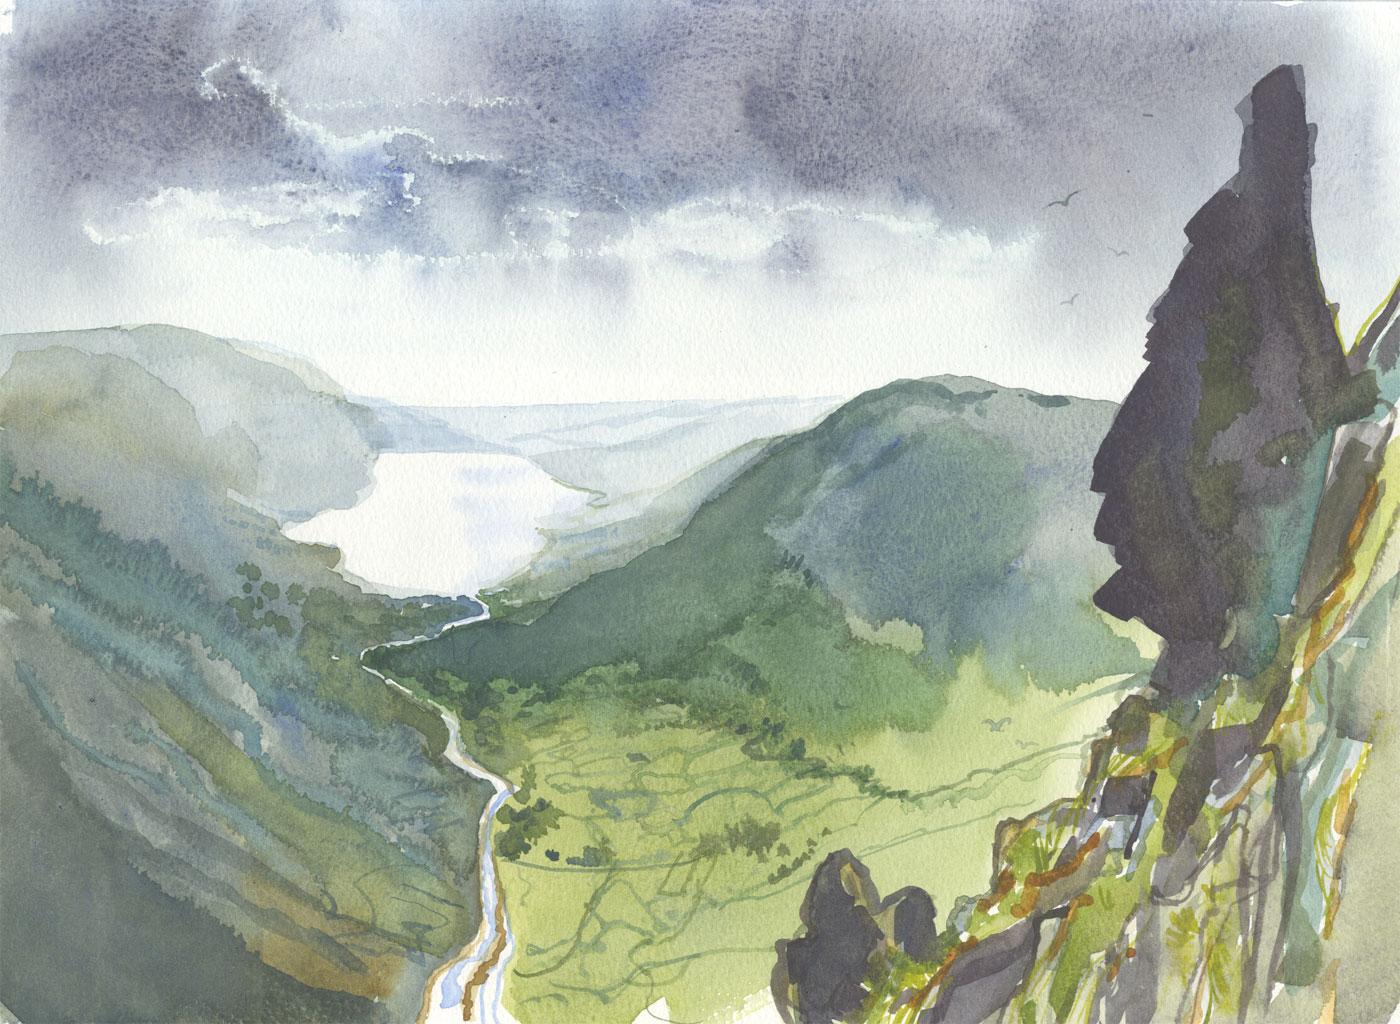 Robert T. Blayney (1929-2016) - Mid 20th Century Watercolour, Valley View